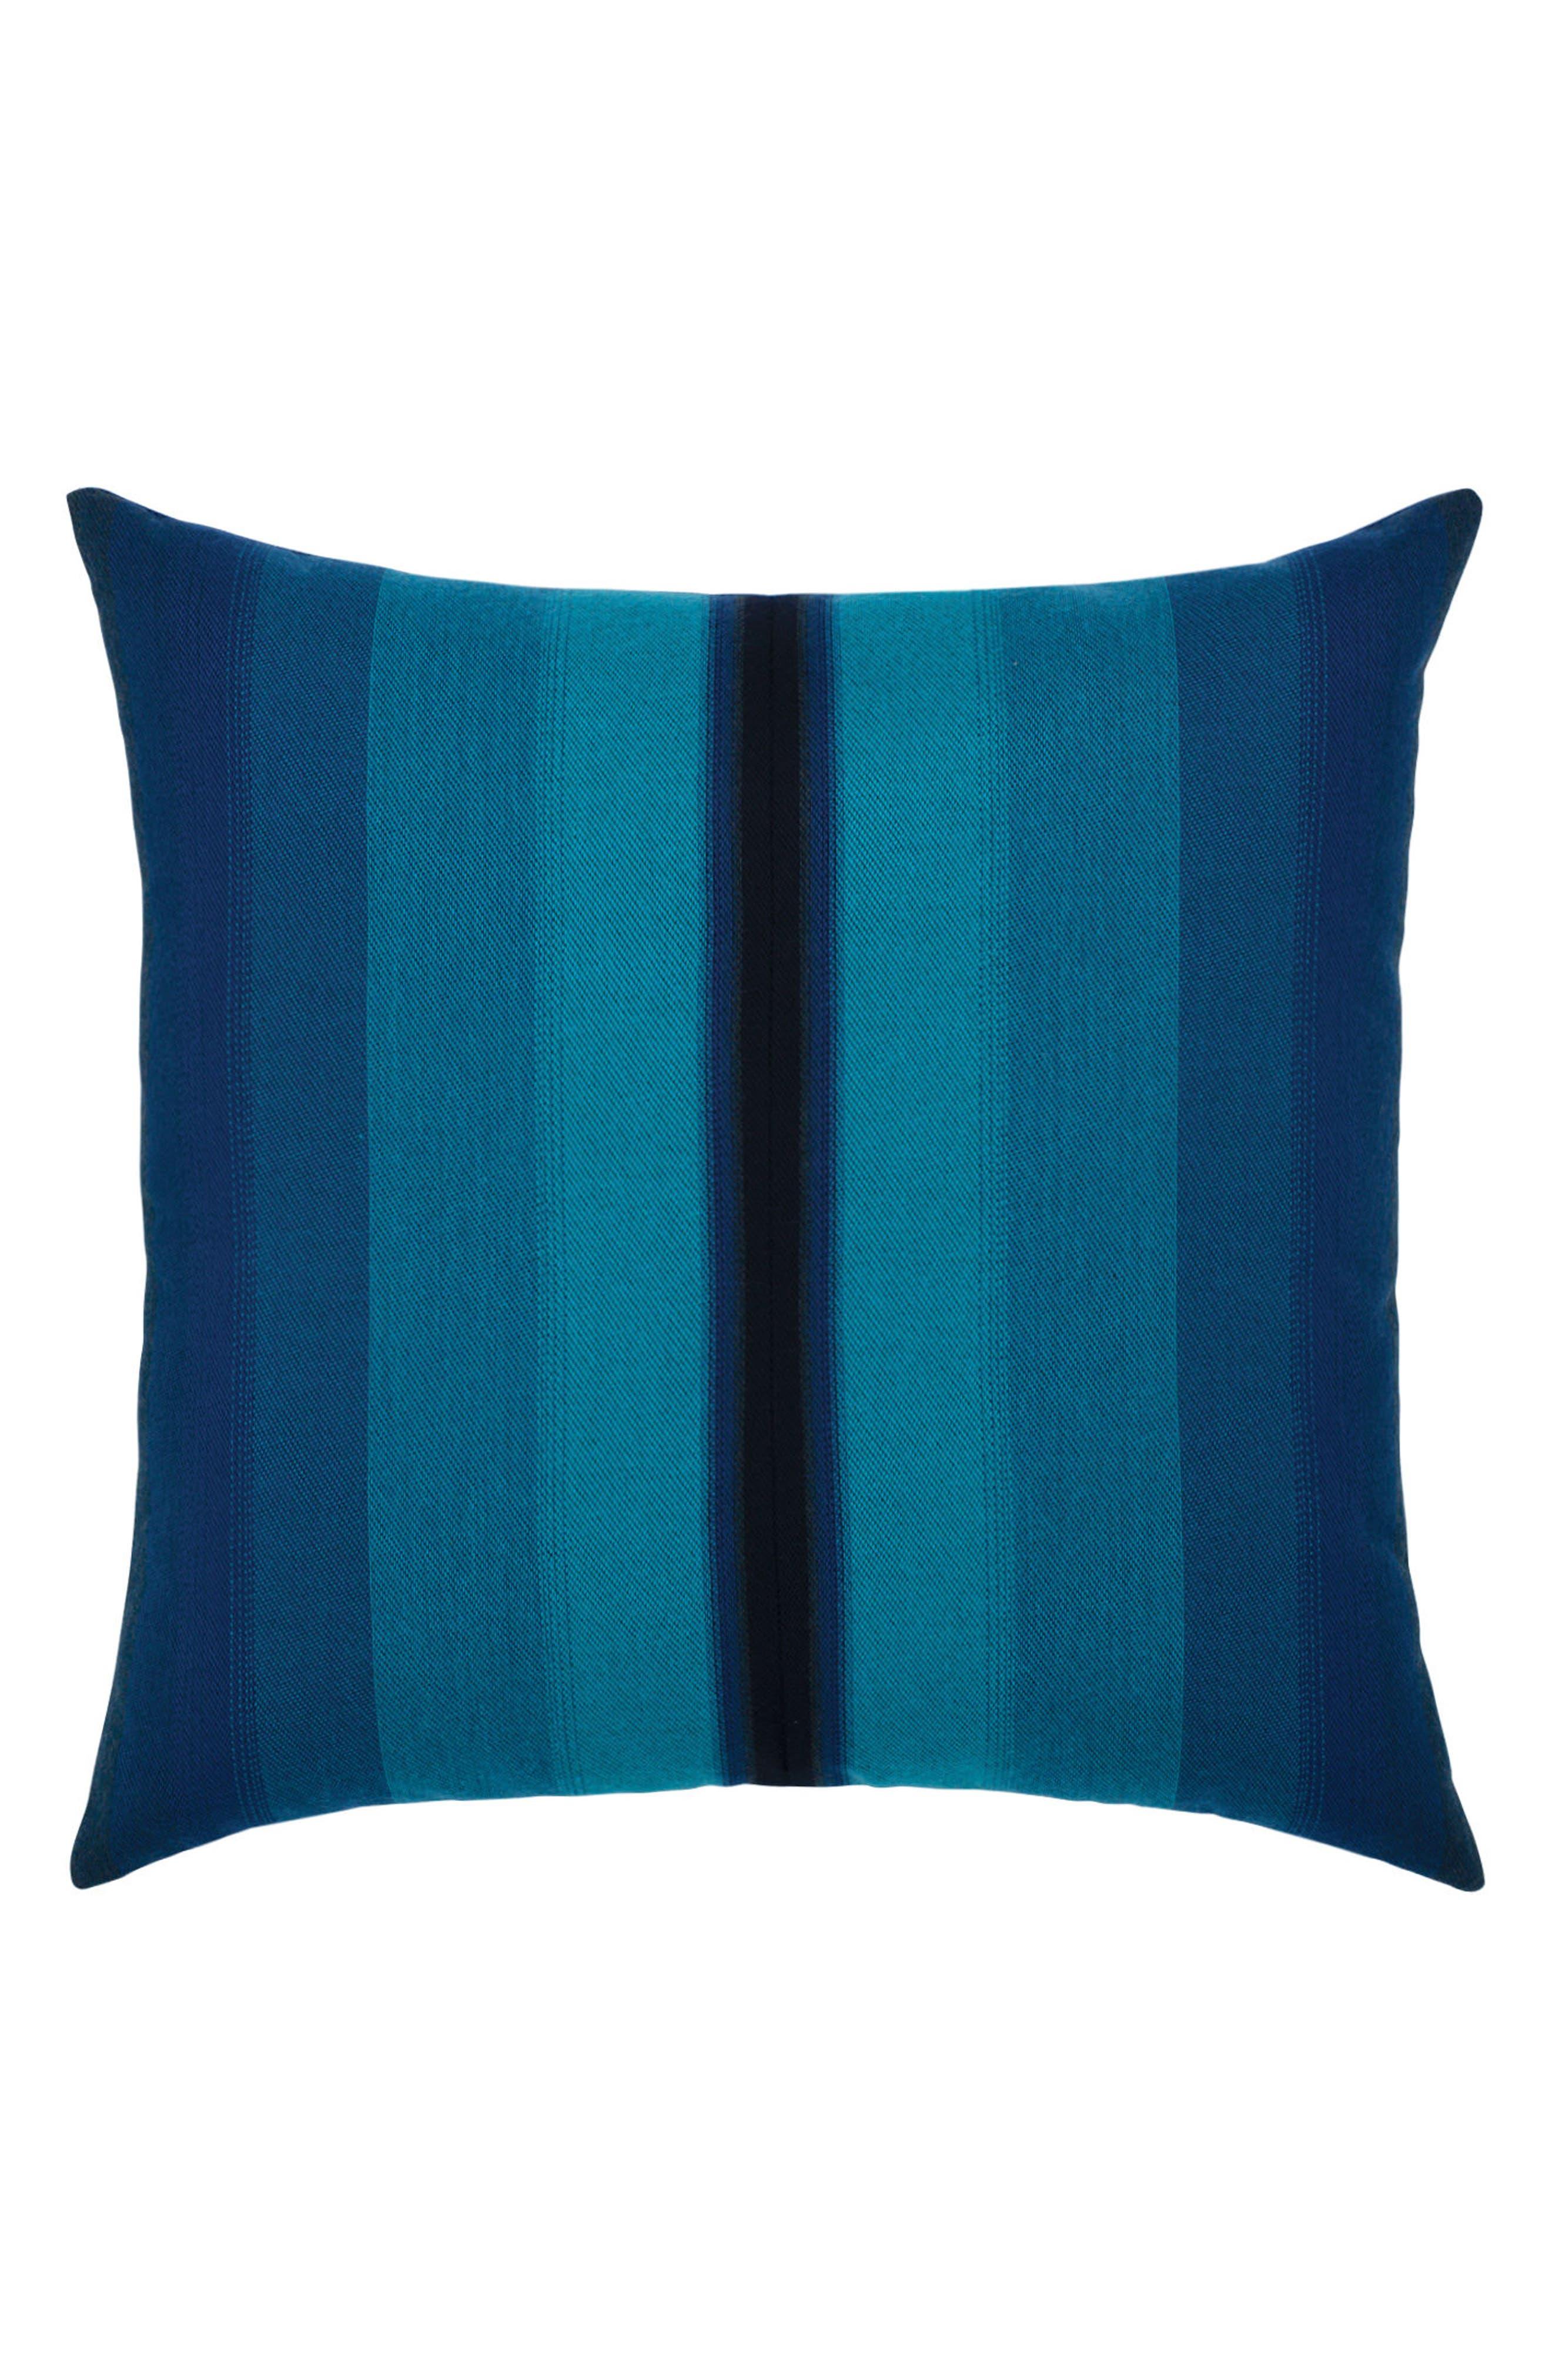 Ombré Azure Indoor/Outdoor Accent Pillow,                             Main thumbnail 1, color,                             Blue